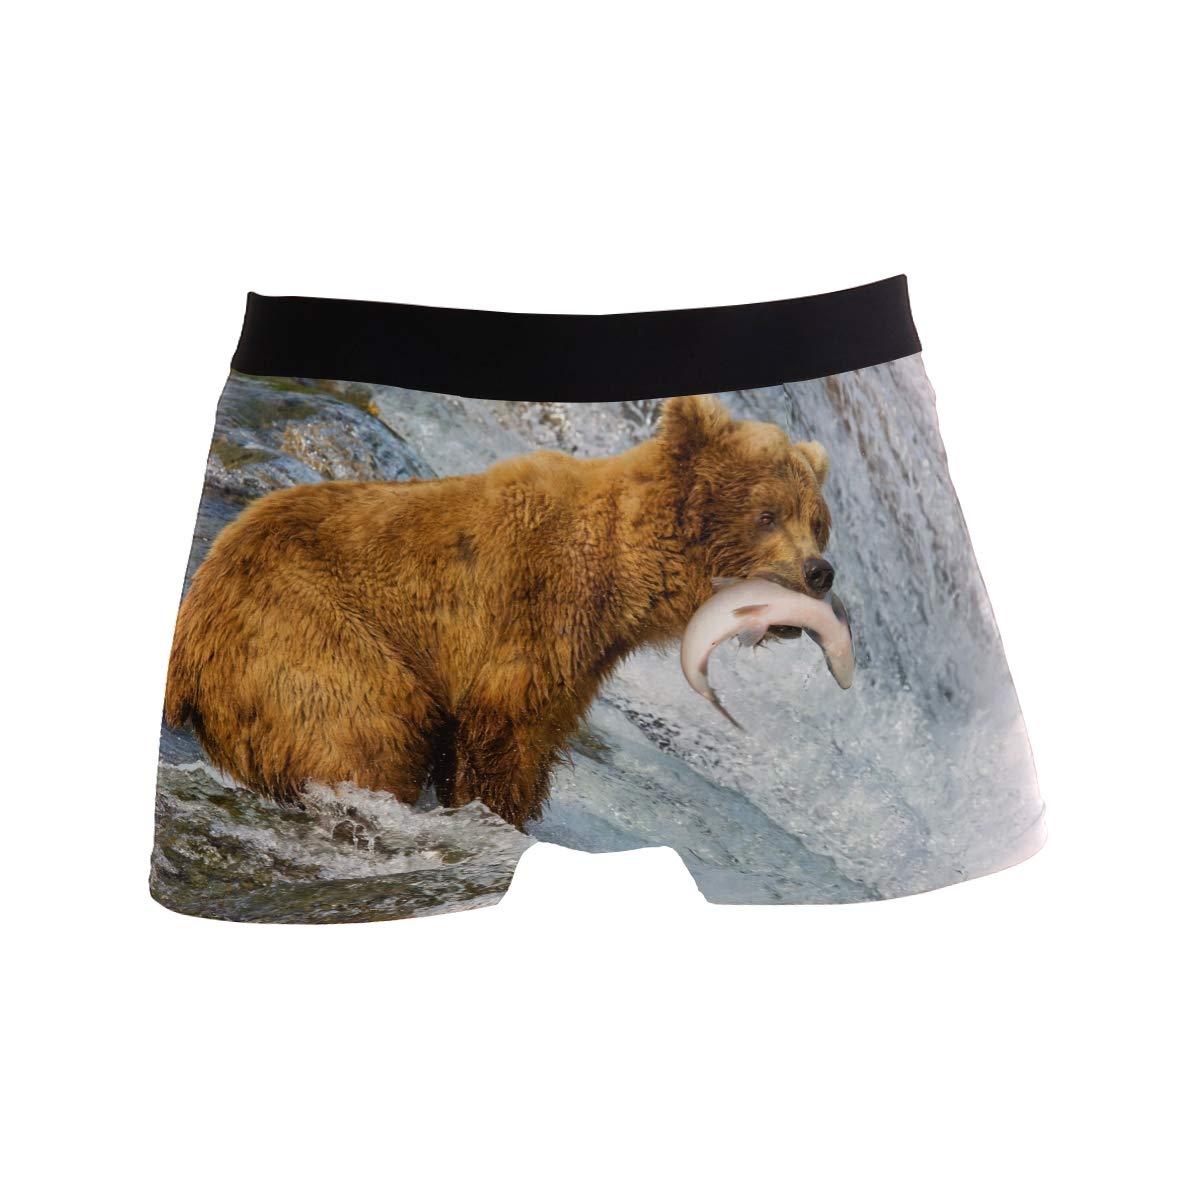 ZZKKO Bear Snow Mens Boxer Briefs Underwear Breathable Stretch Boxer Trunk with Pouch S-XL